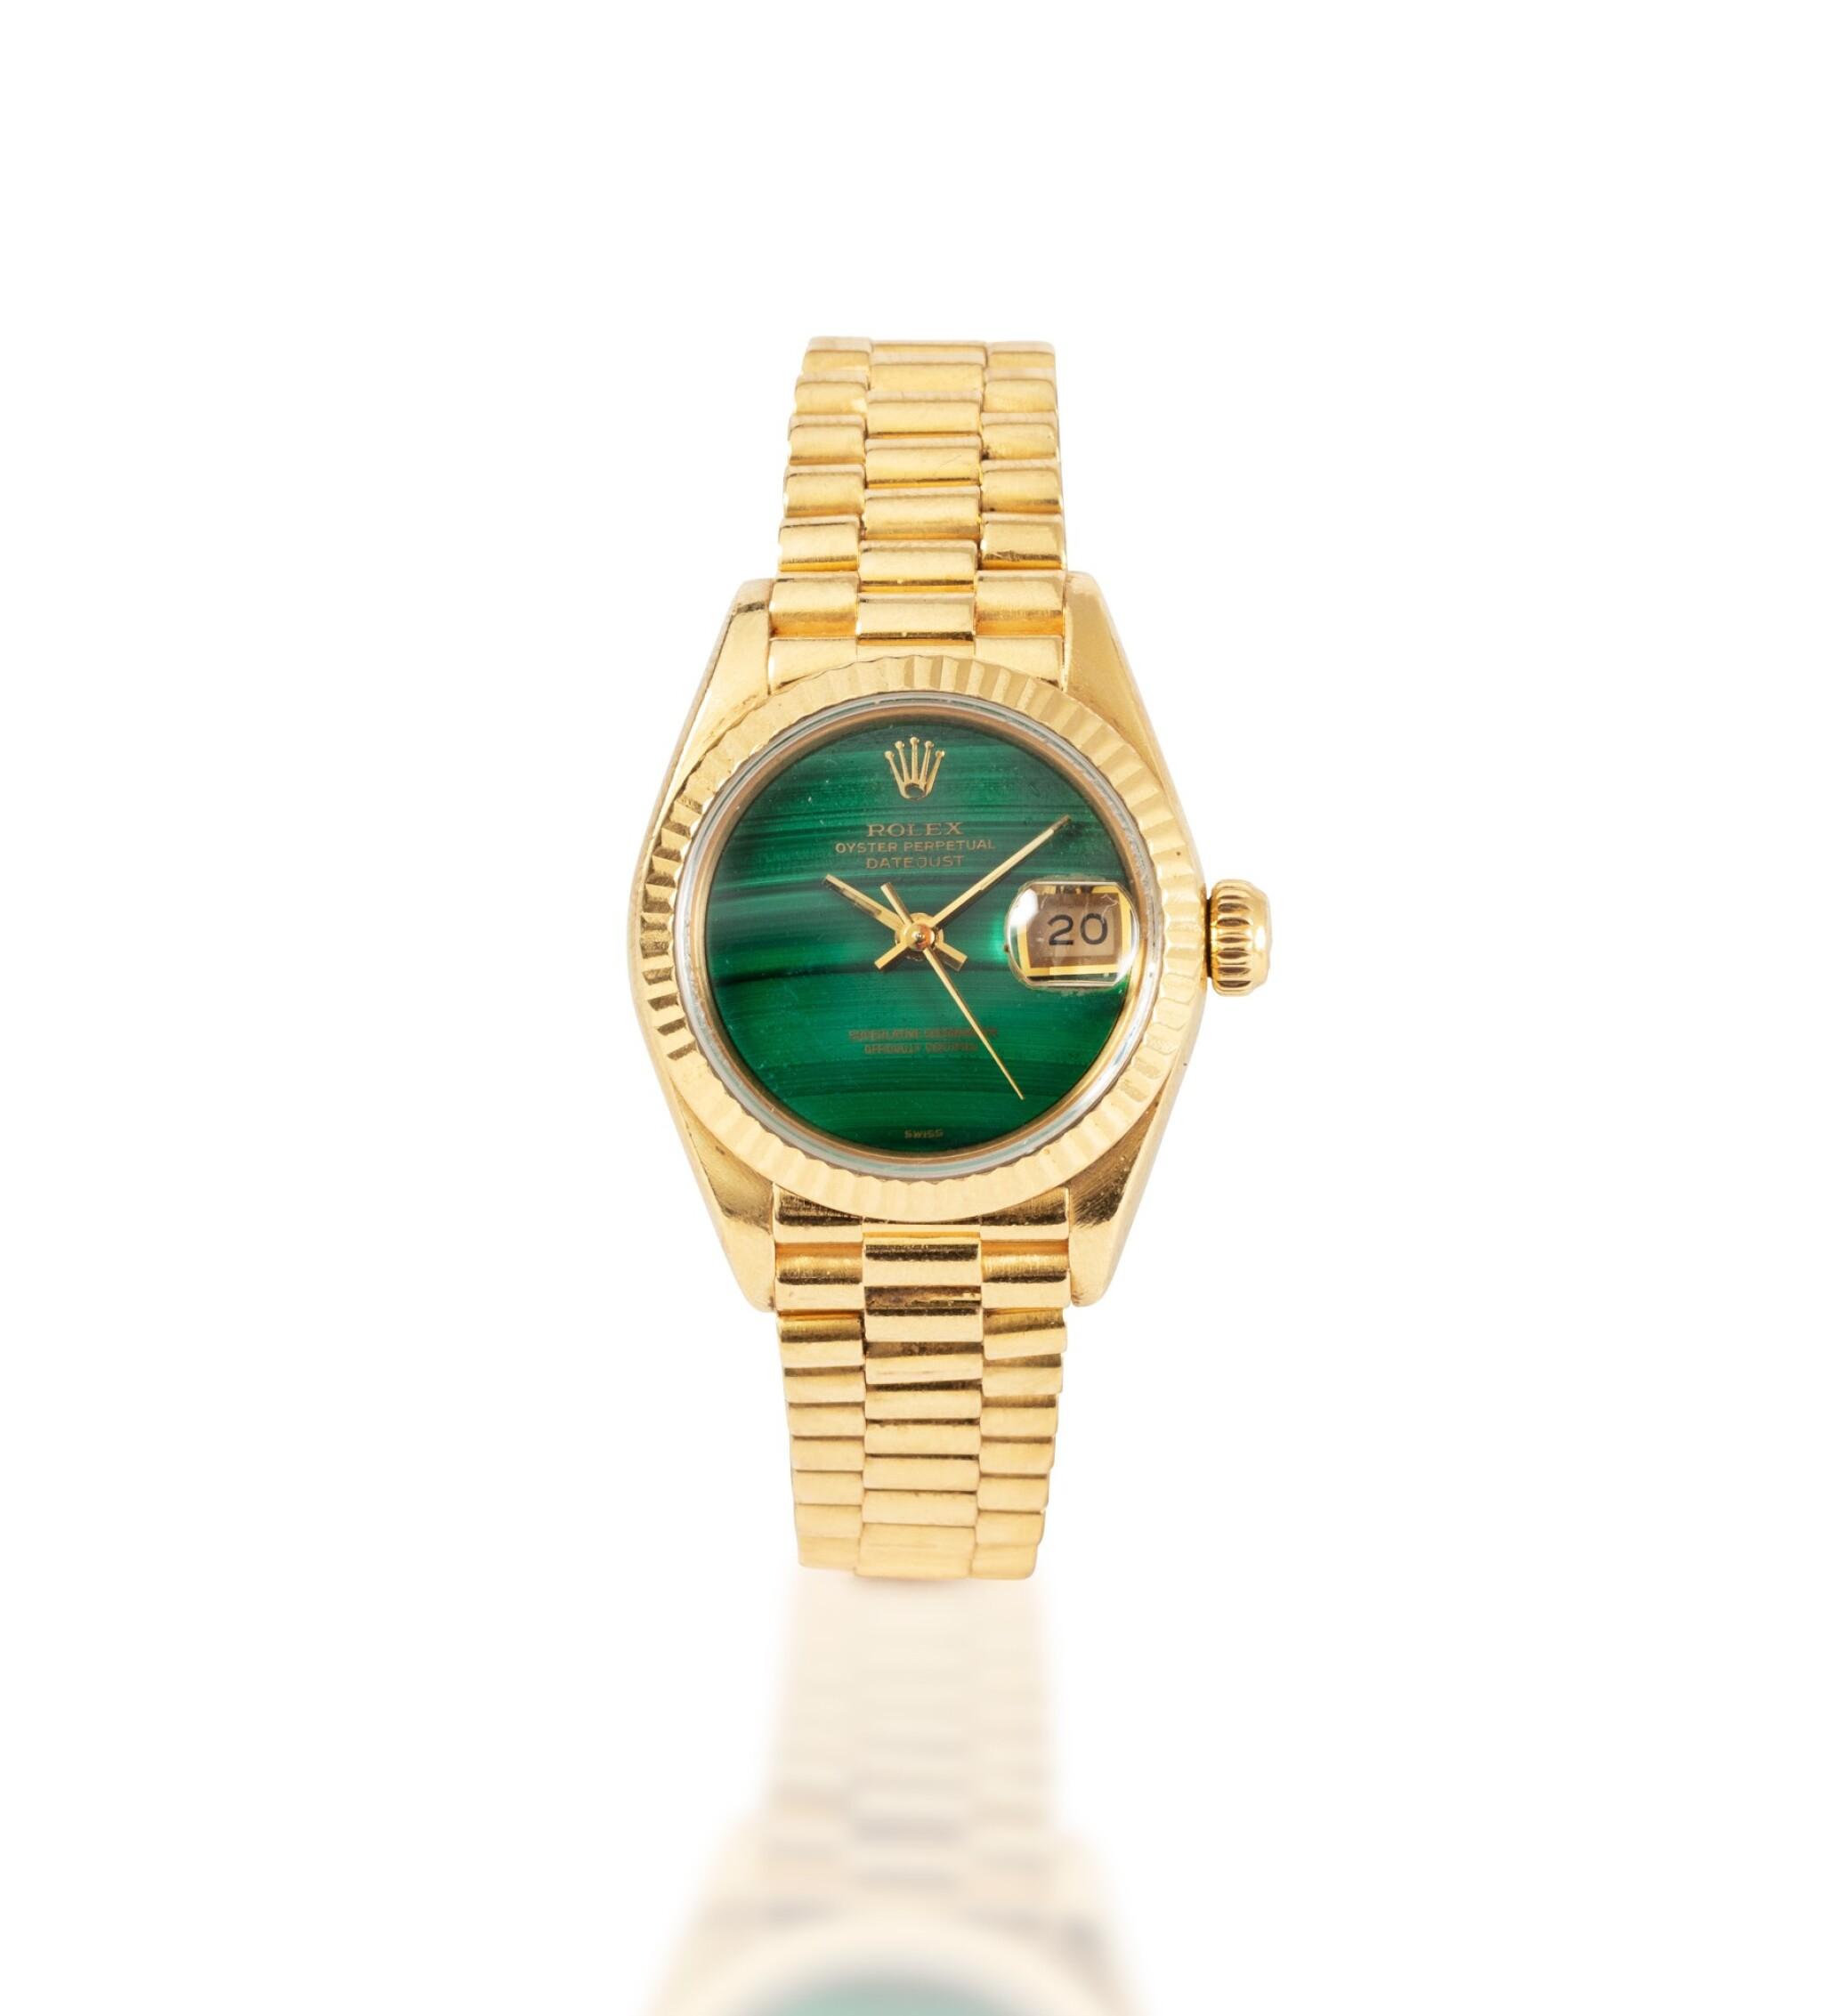 View full screen - View 1 of Lot 77. Rolex | Montre bracelet de dame or et malachite | Gold and malachite lady's bracelet watch.